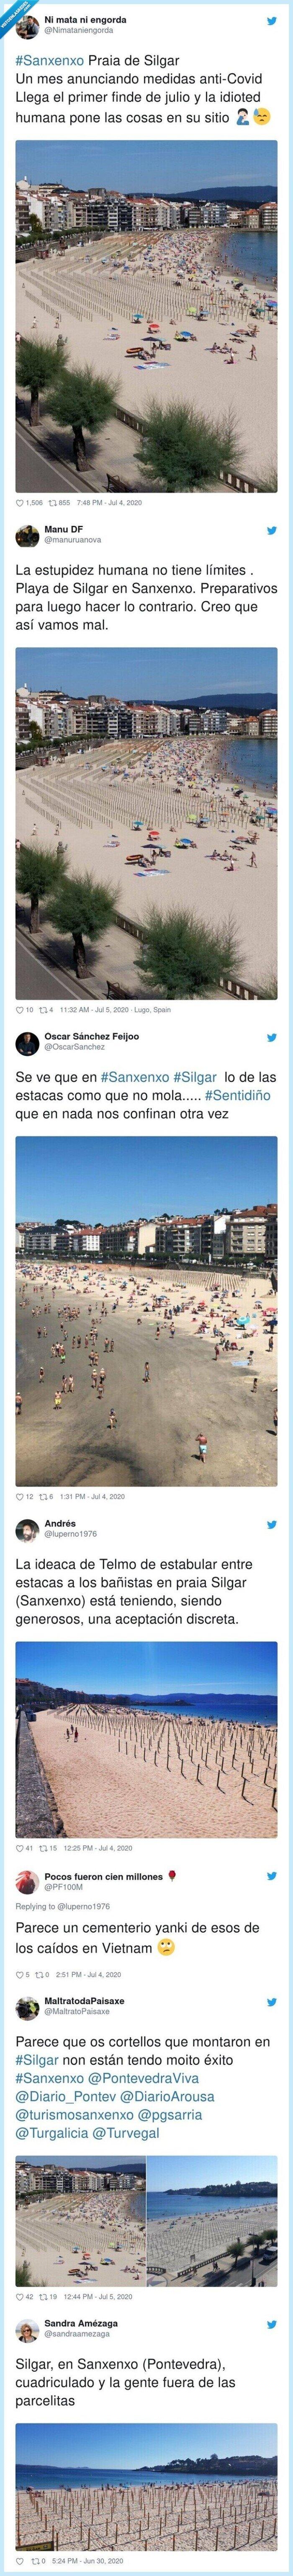 distanciamiento,galicia,medidas,playa,sanxenxo,silgar